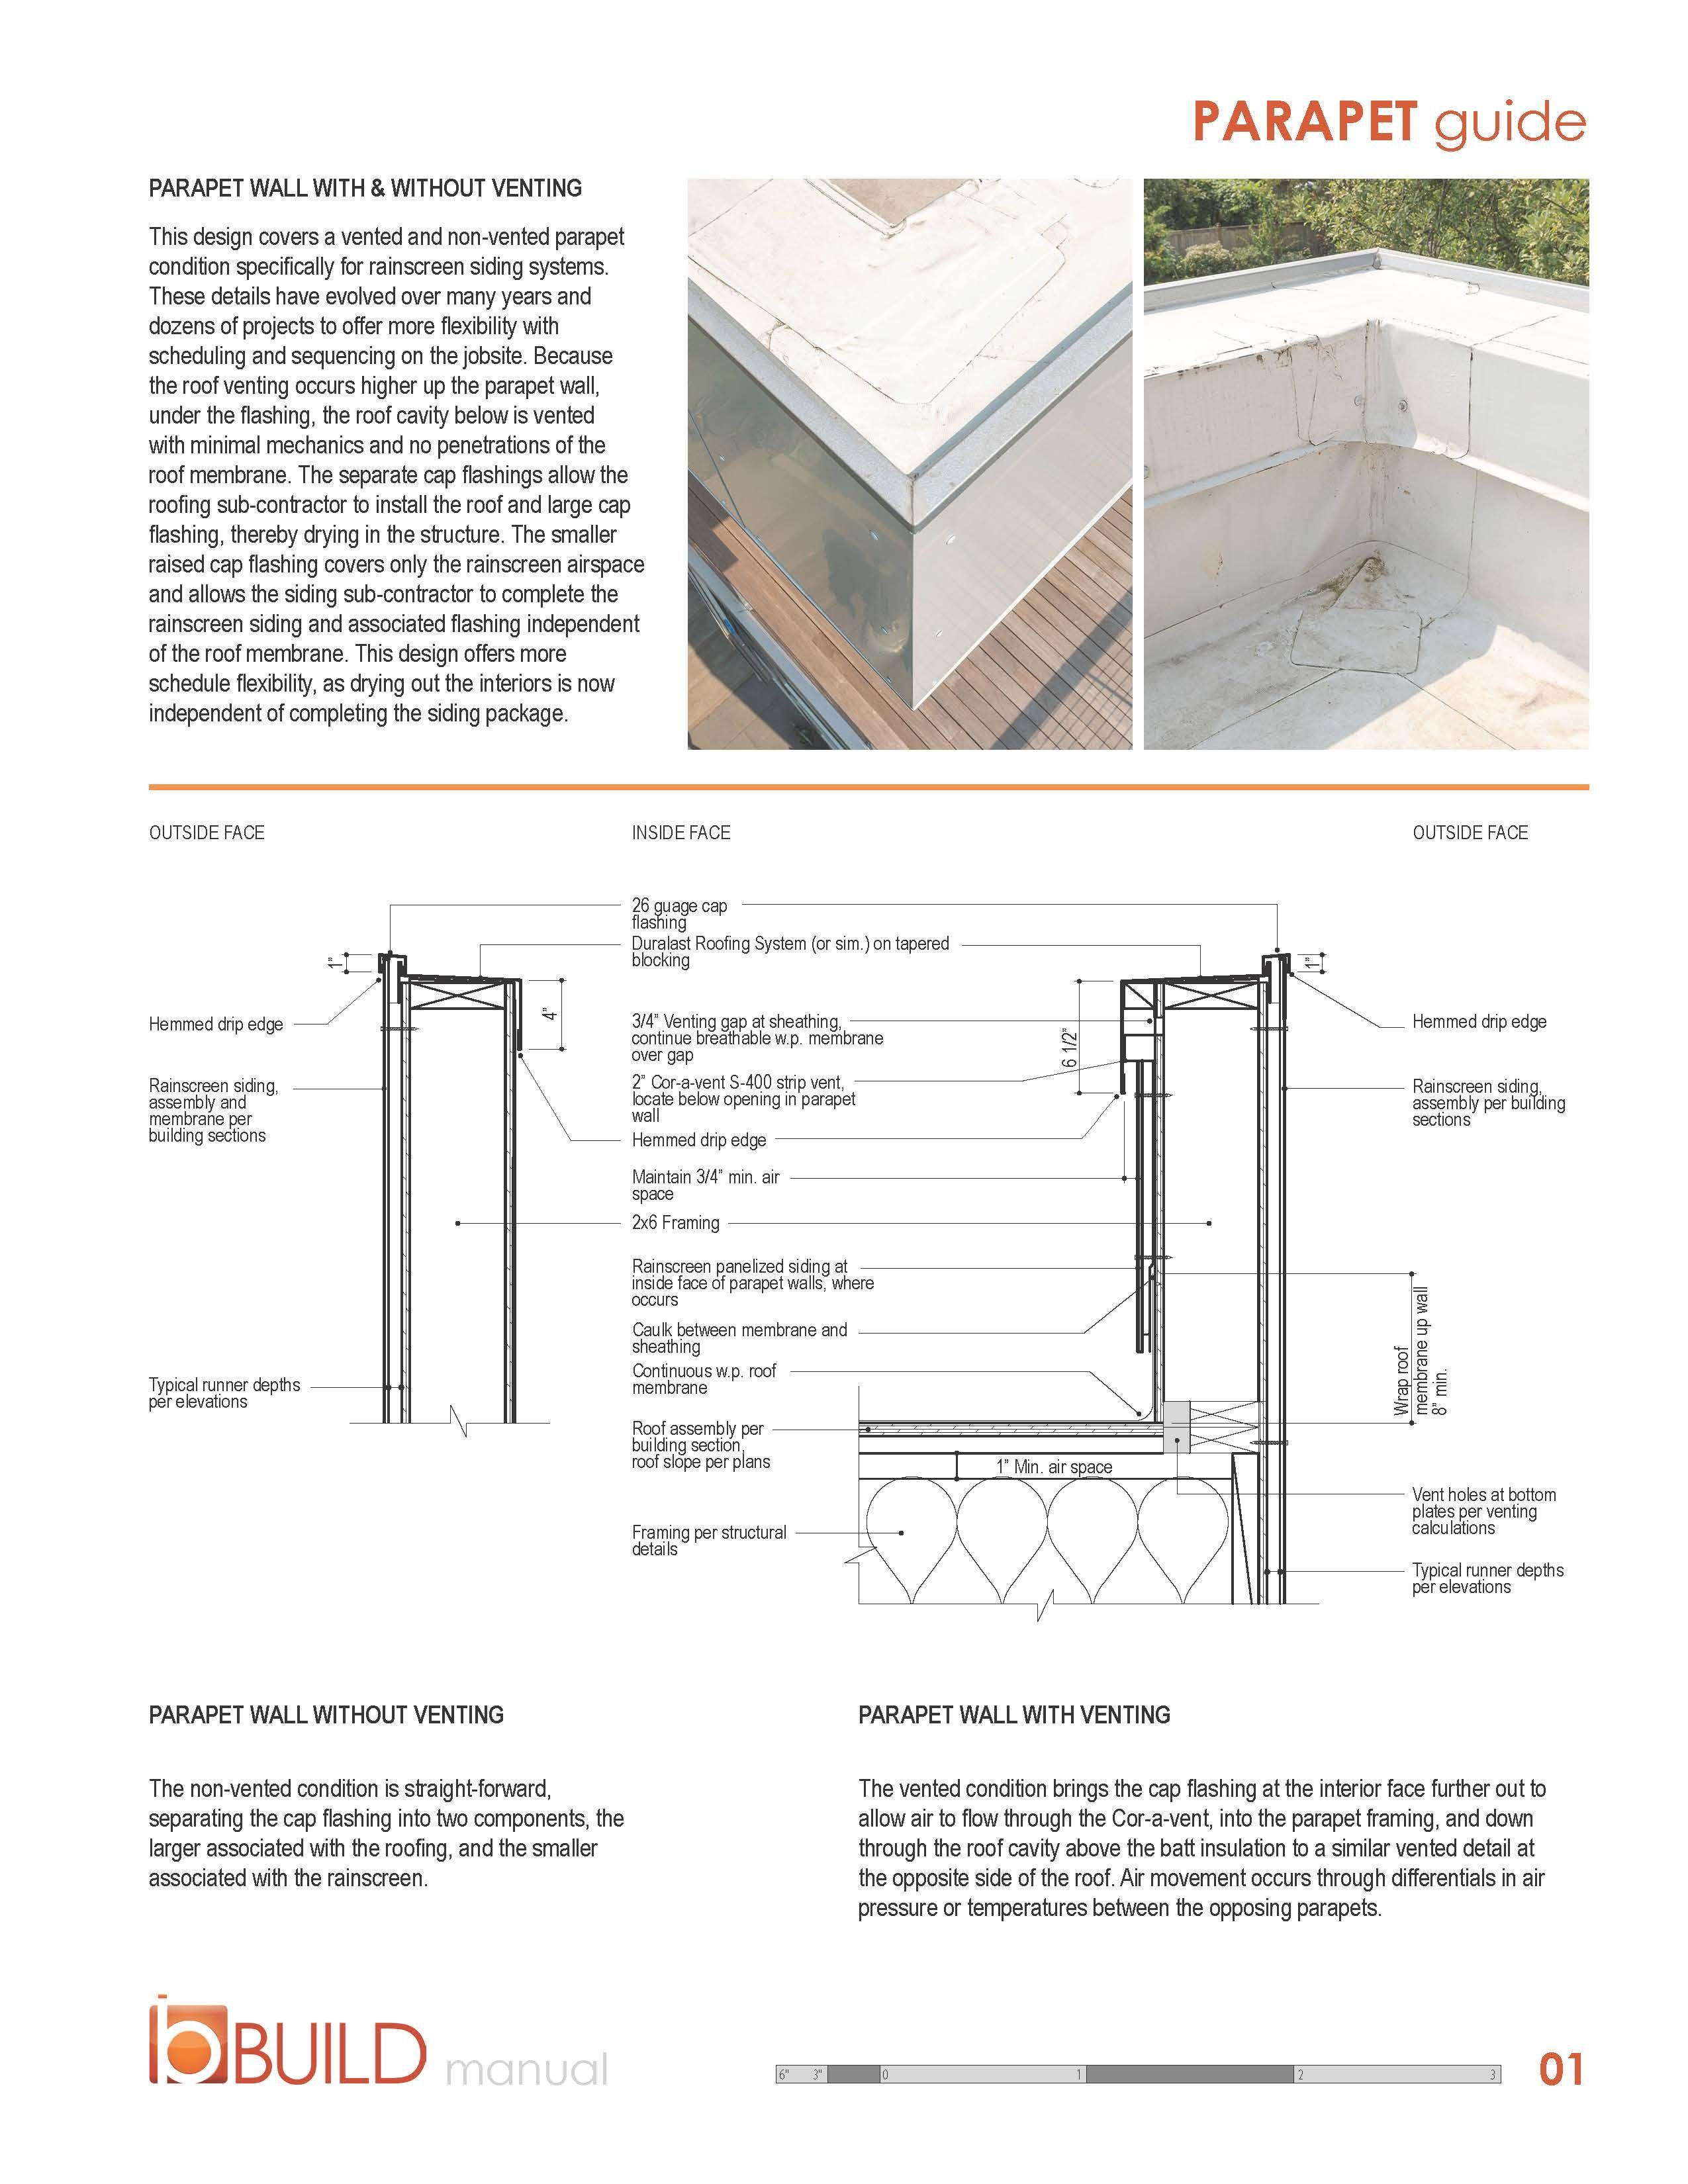 Parapet Manual Jpg 2550 3300 Parapet Rainscreen Design